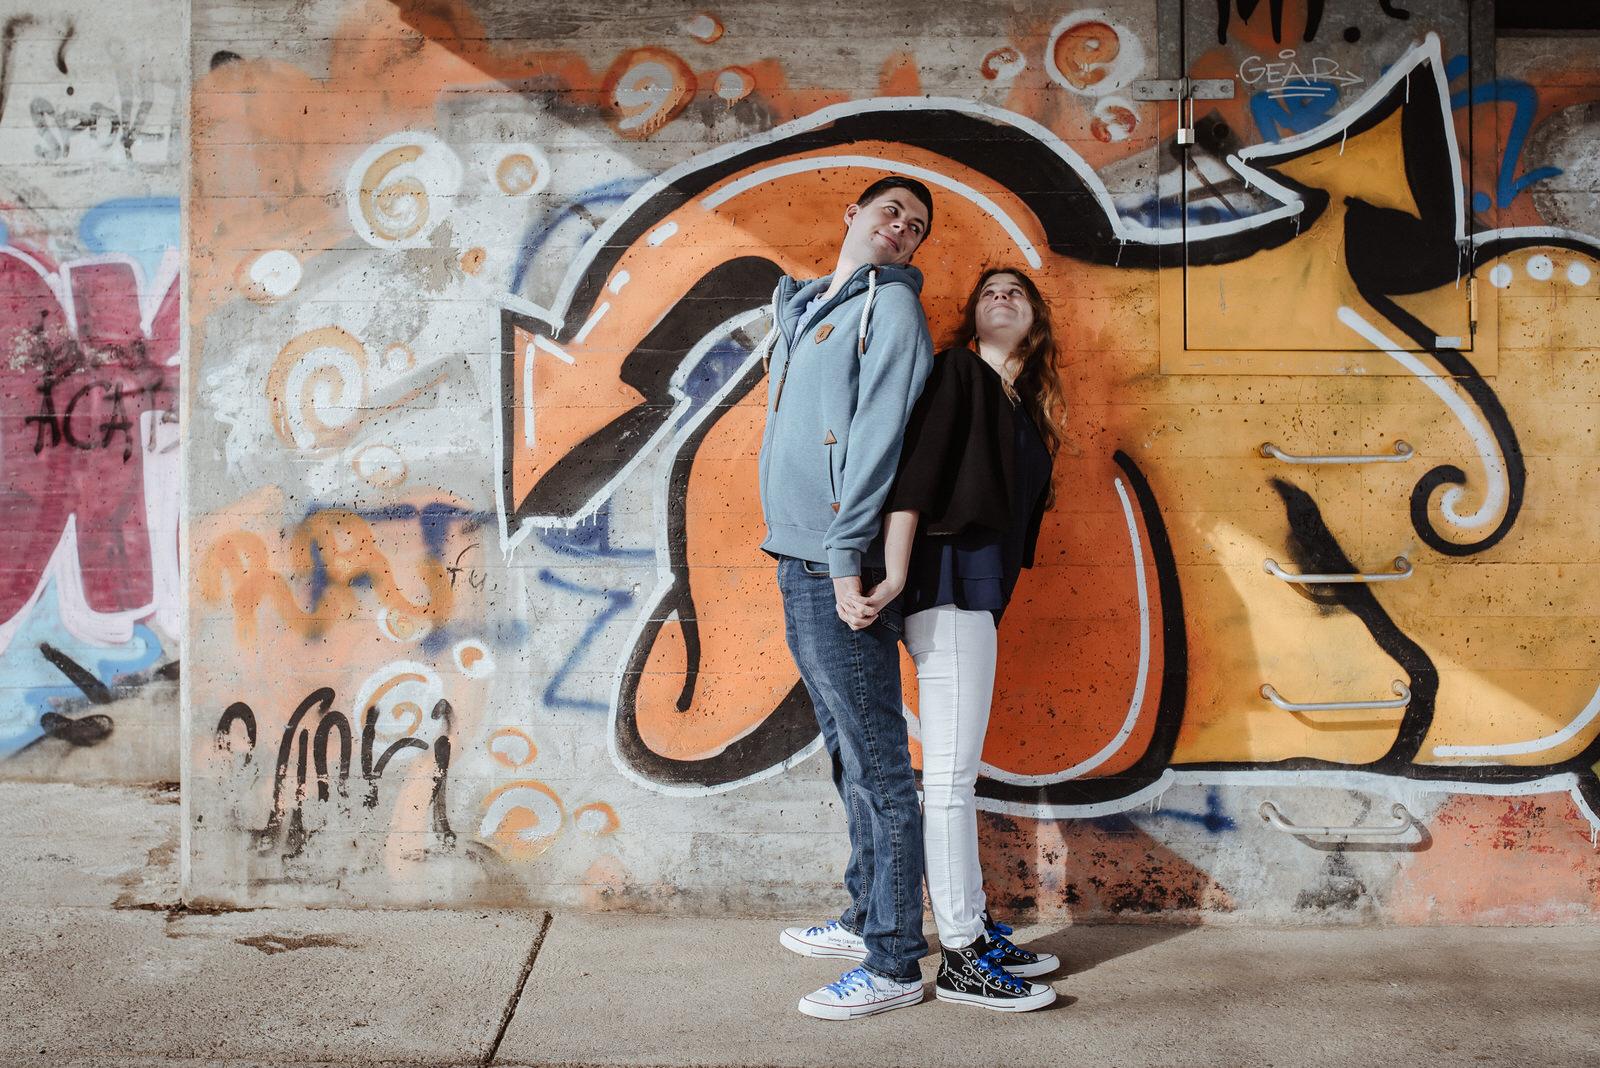 Paar Shooting am Fluss 11i-photography.com